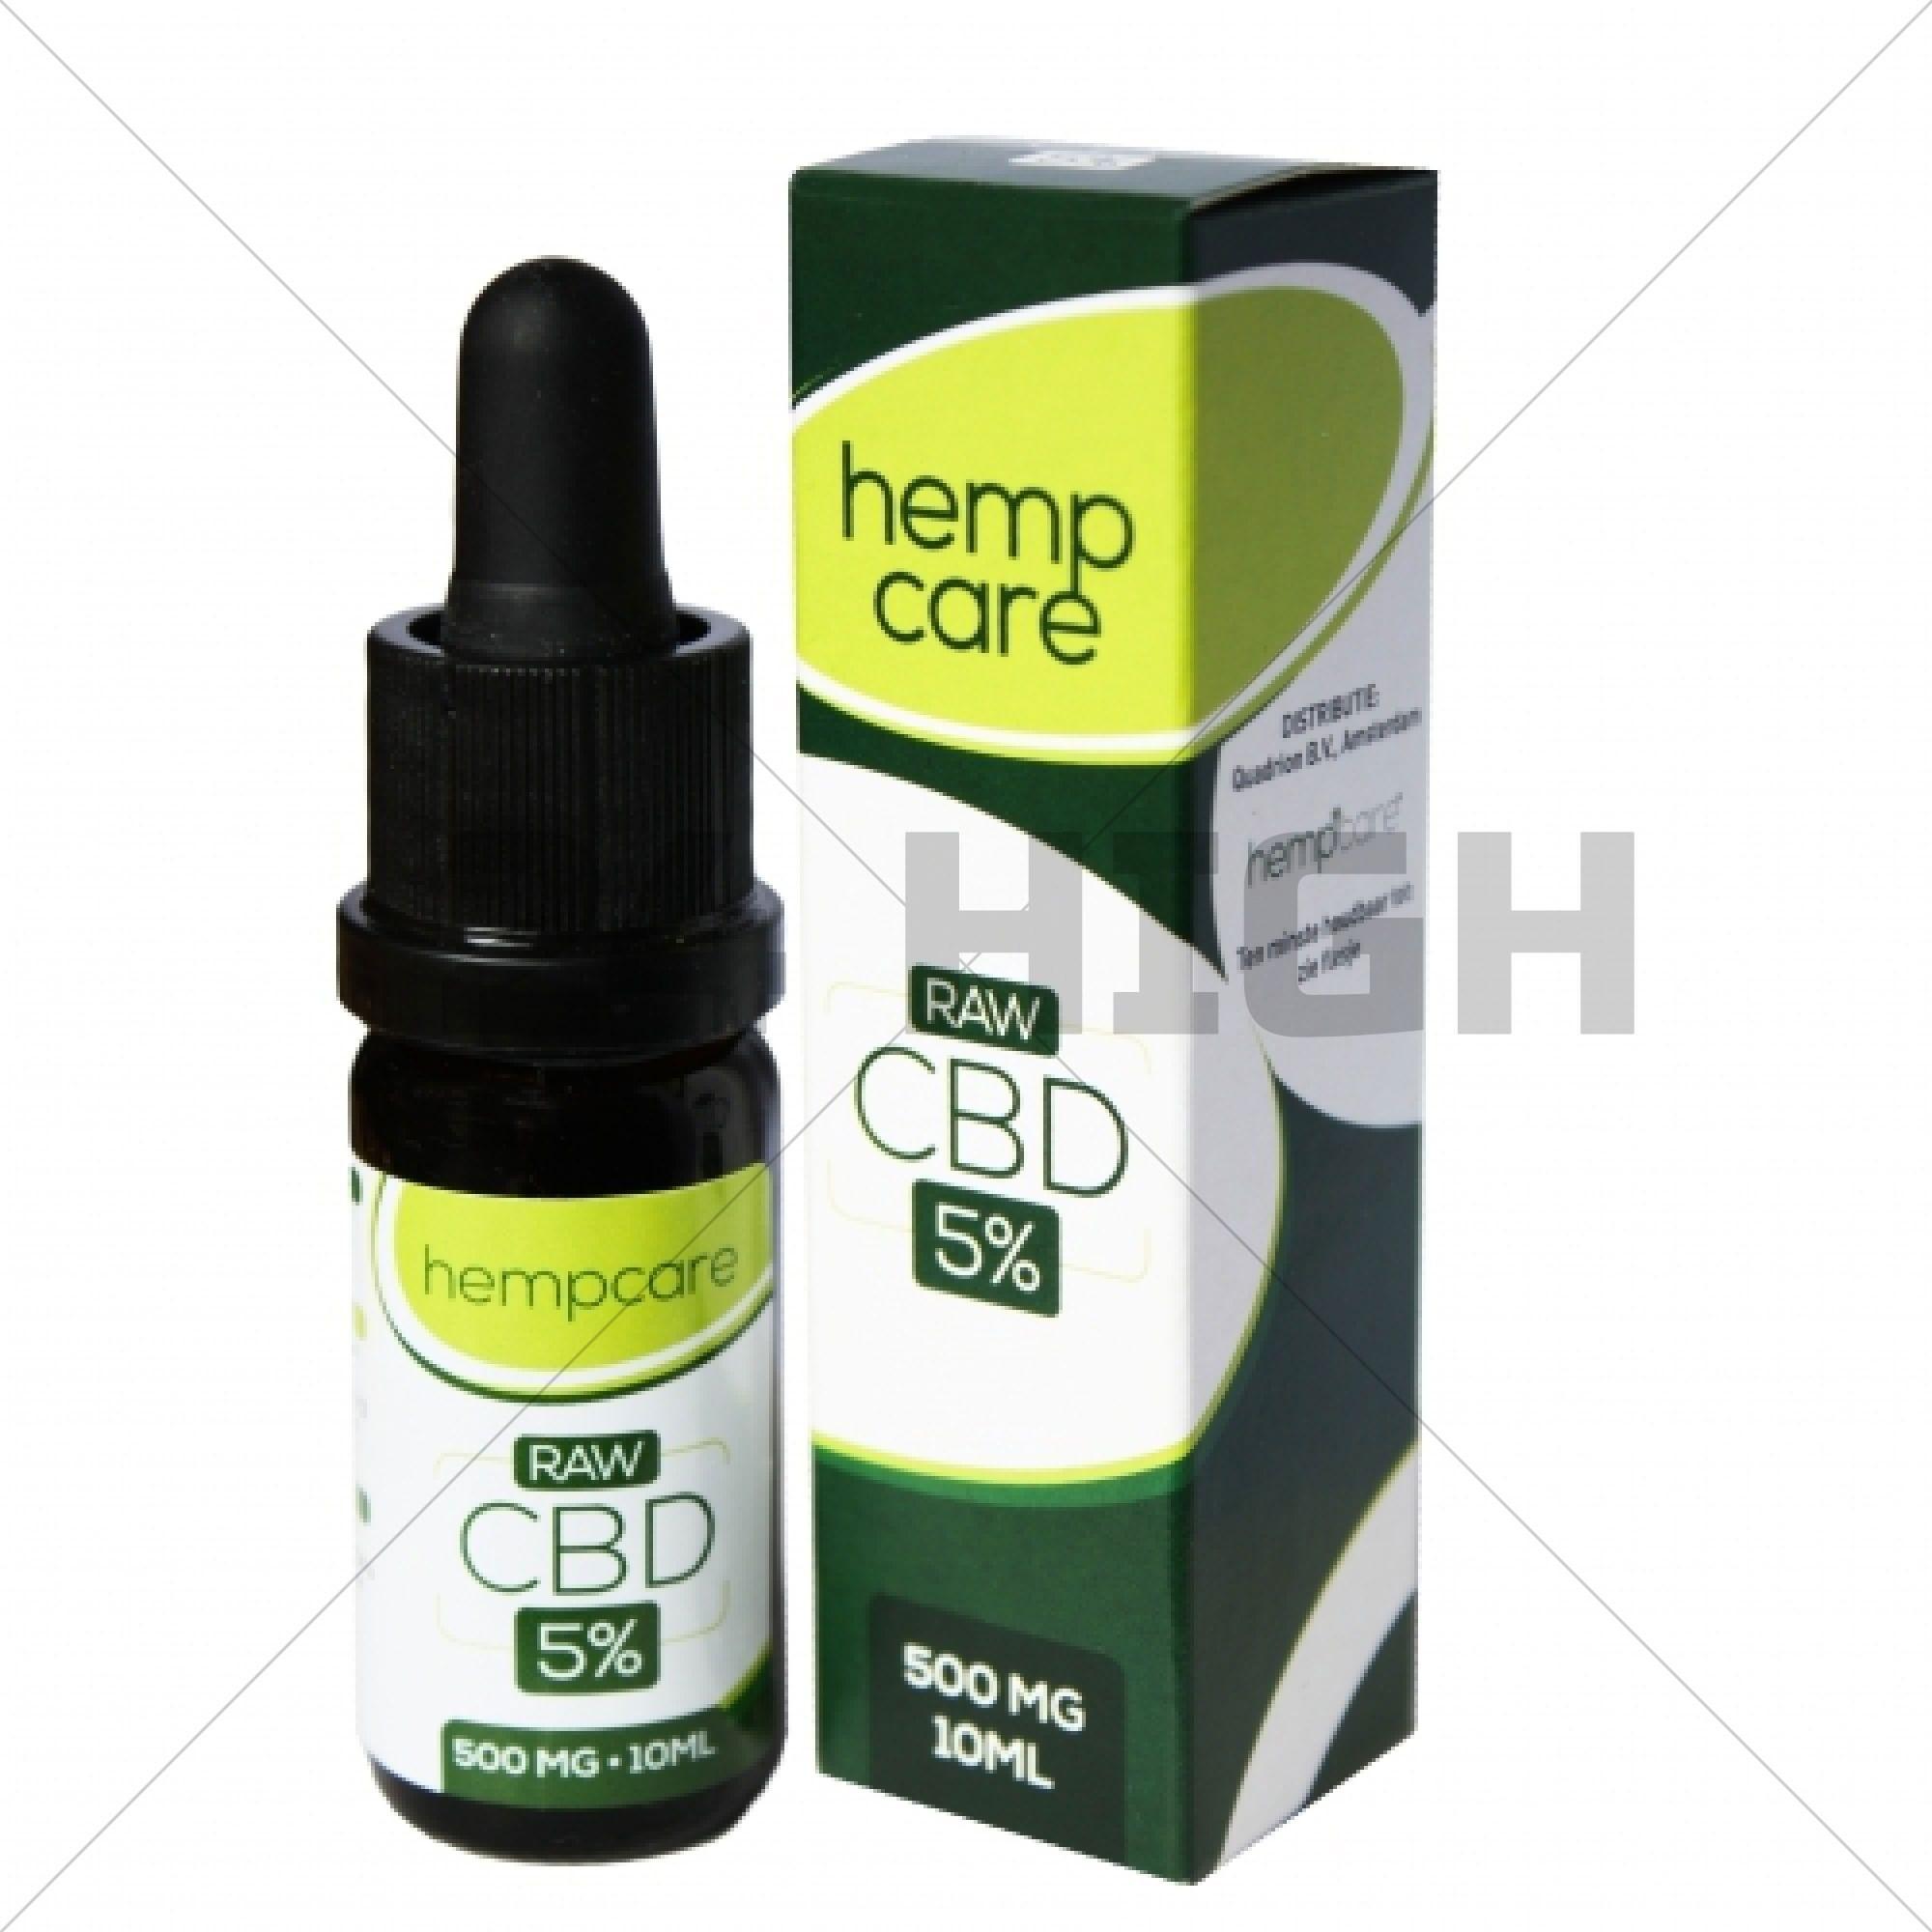 Hempcare CBD RAW 5%